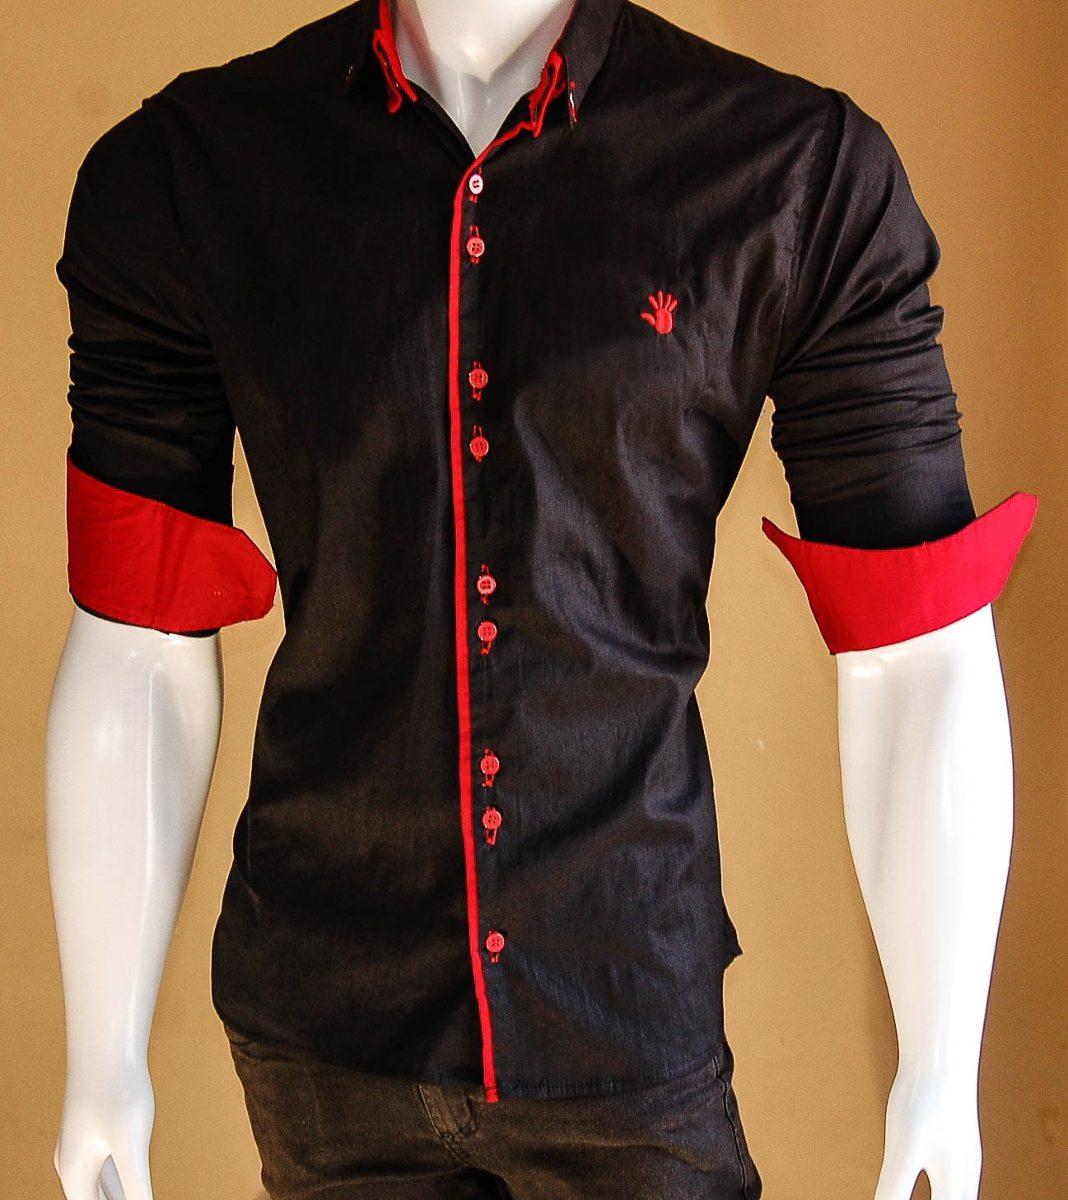 camisa social slim fit masculina fabrica o pronta entrega